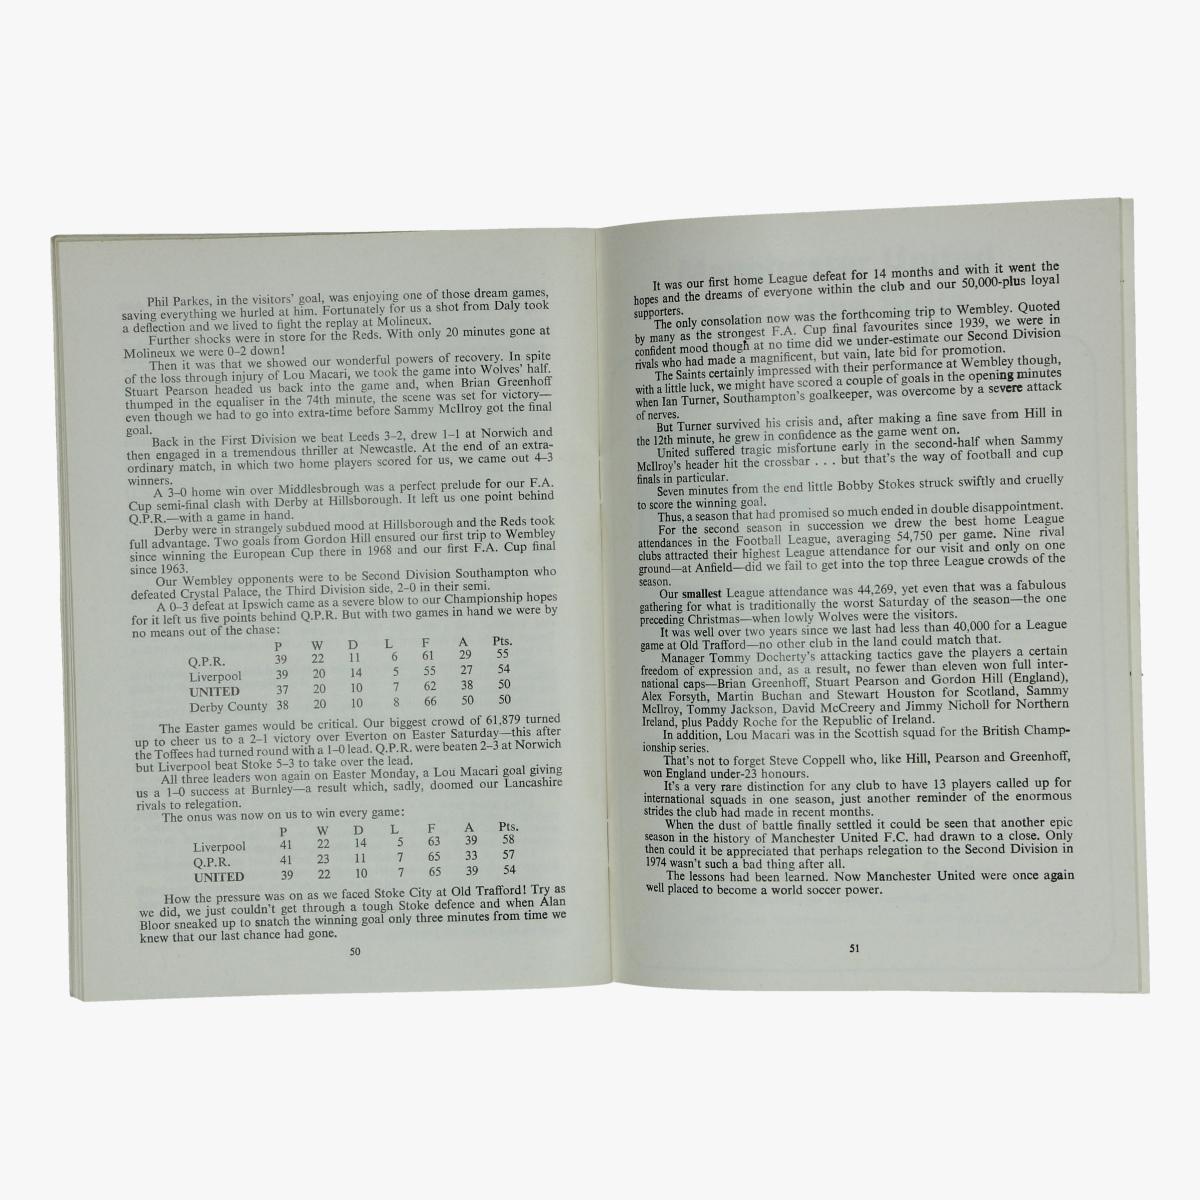 Afbeeldingen van voetbalboekje the history of manchester united footbal club 1976